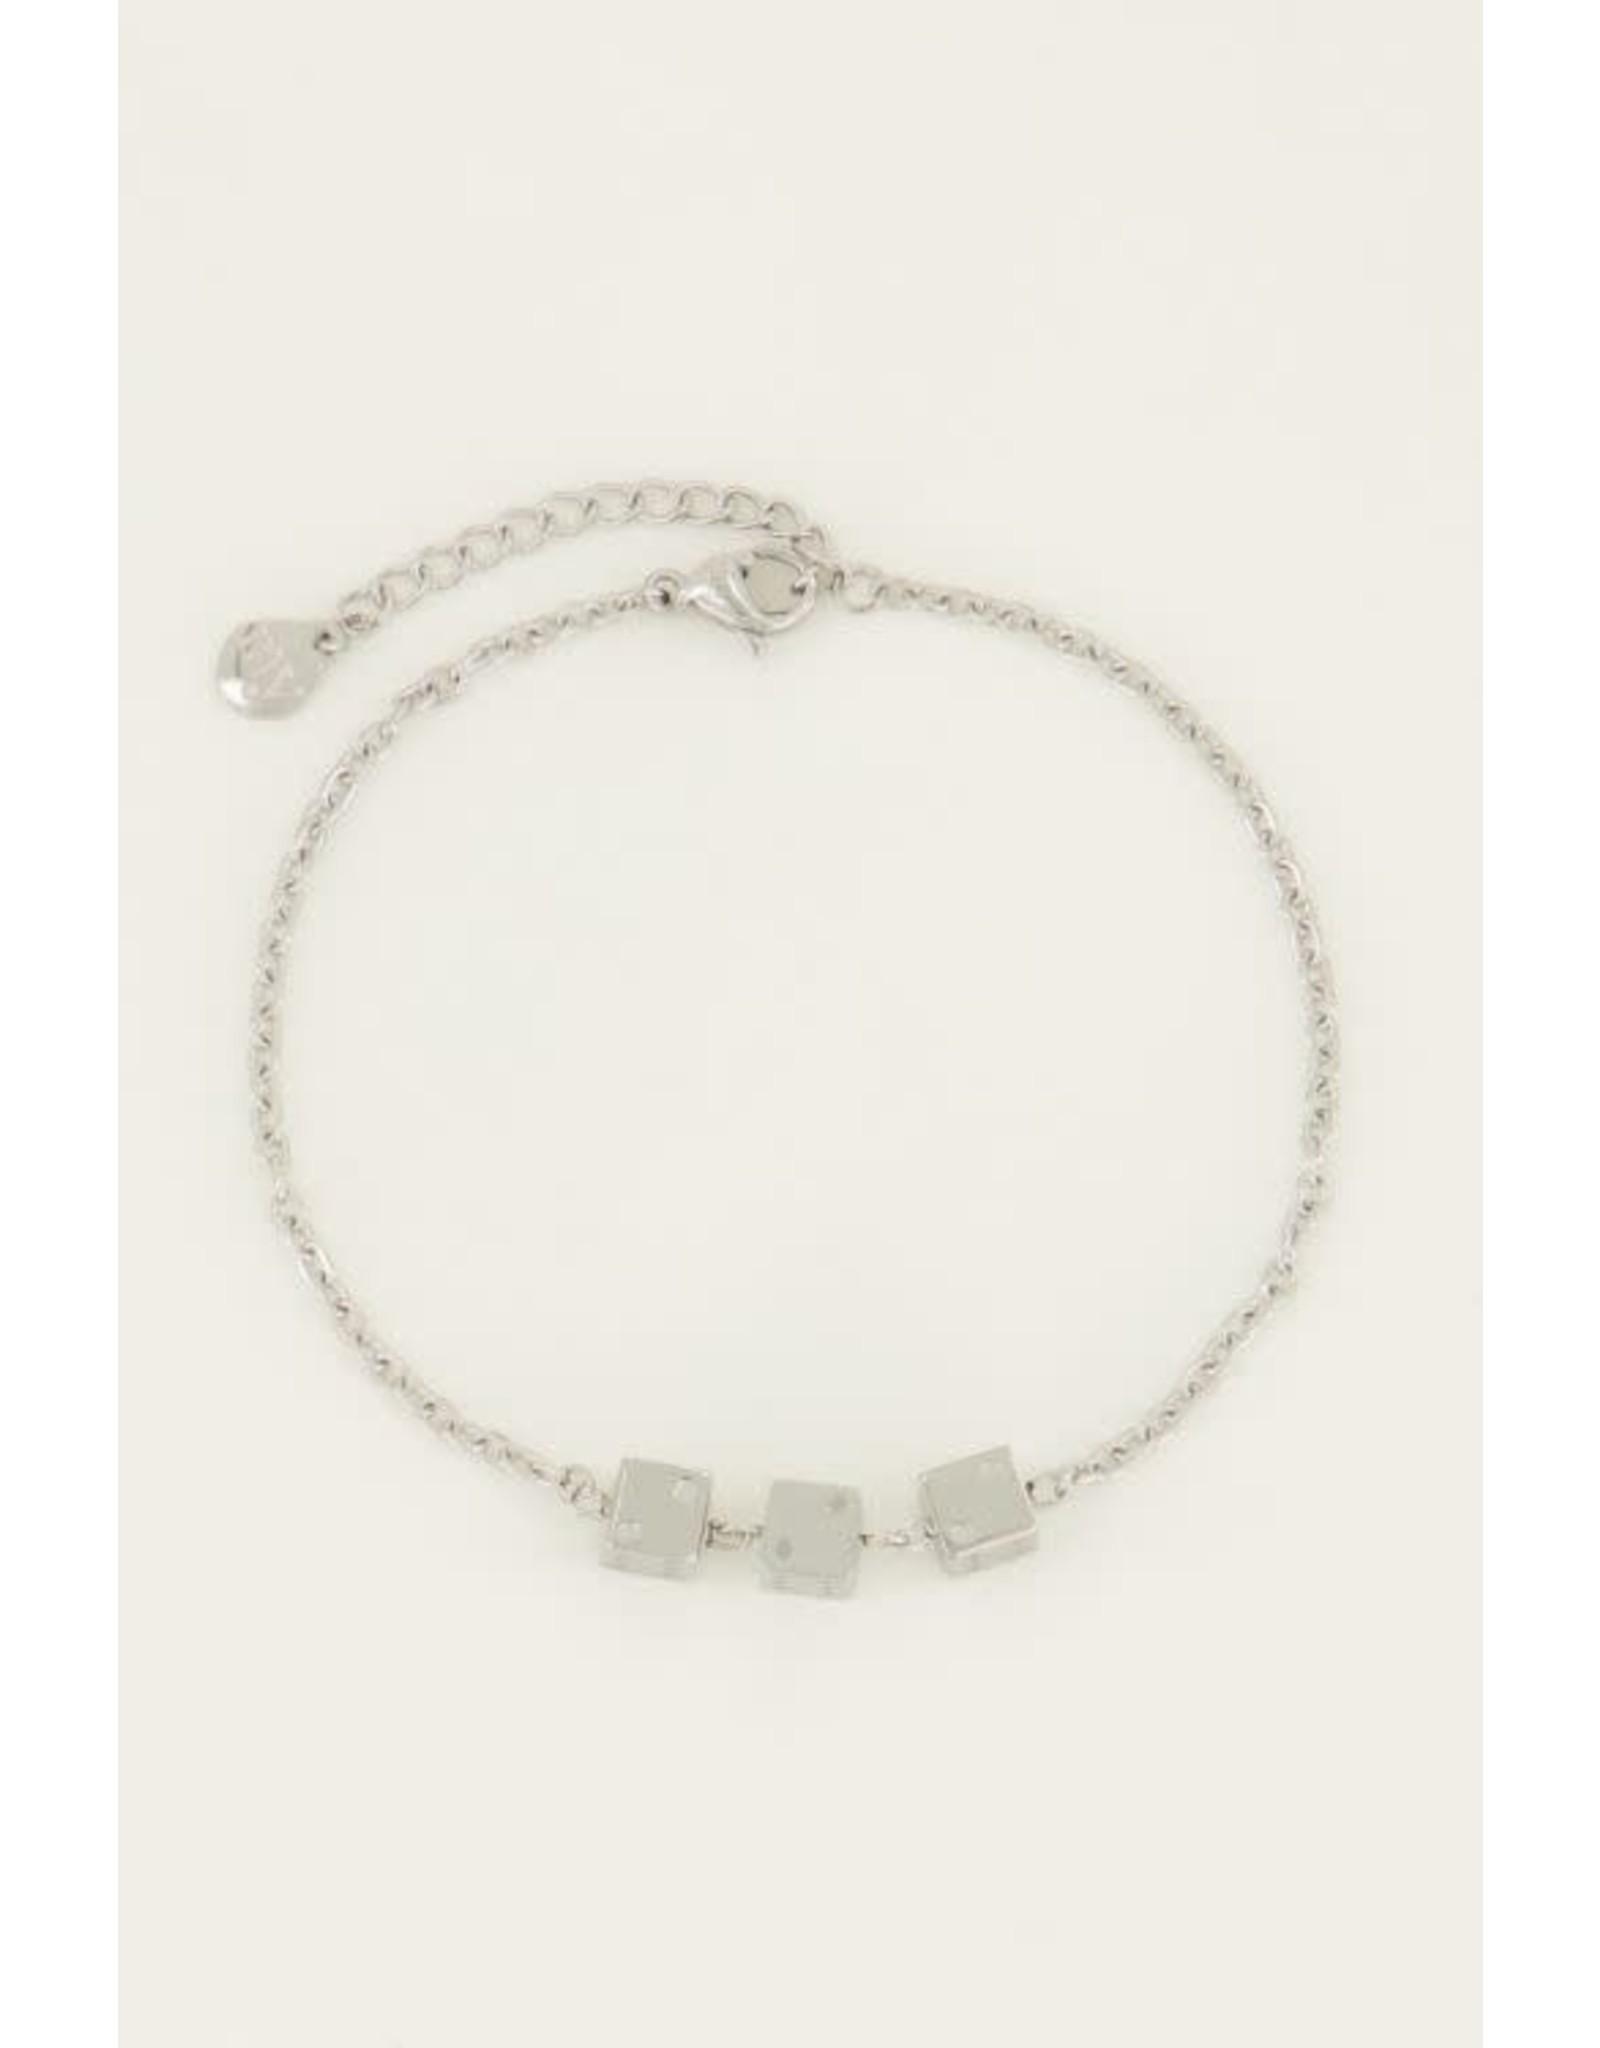 My Jewellery My Jewelllery armband drie dobbelsteentjes